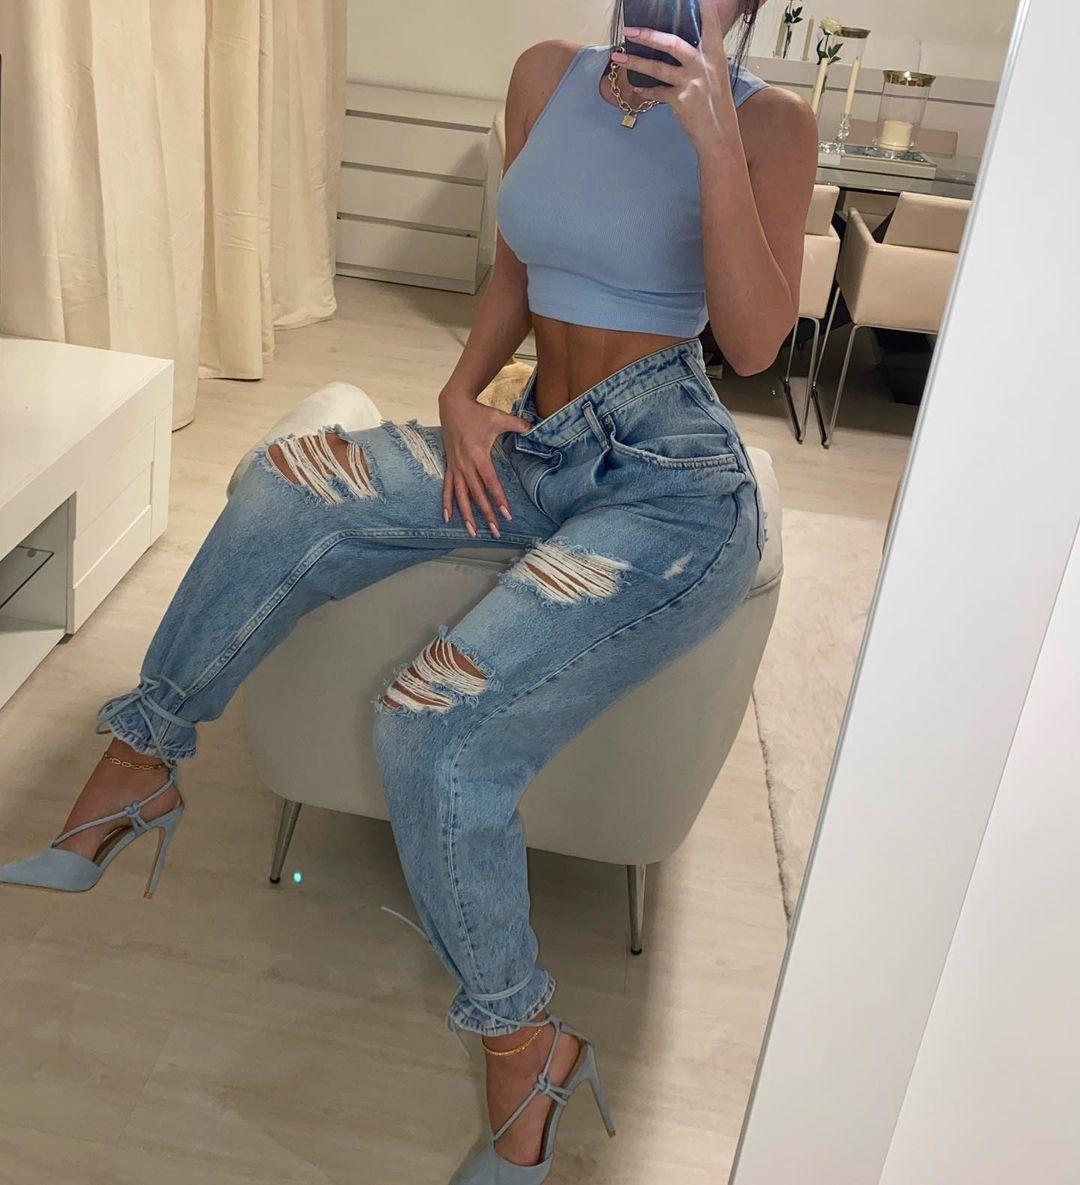 mmadalena.ramos 92325285 298056627843082 9076299741492736332 n How to wear Skinny Jeans with Y2K